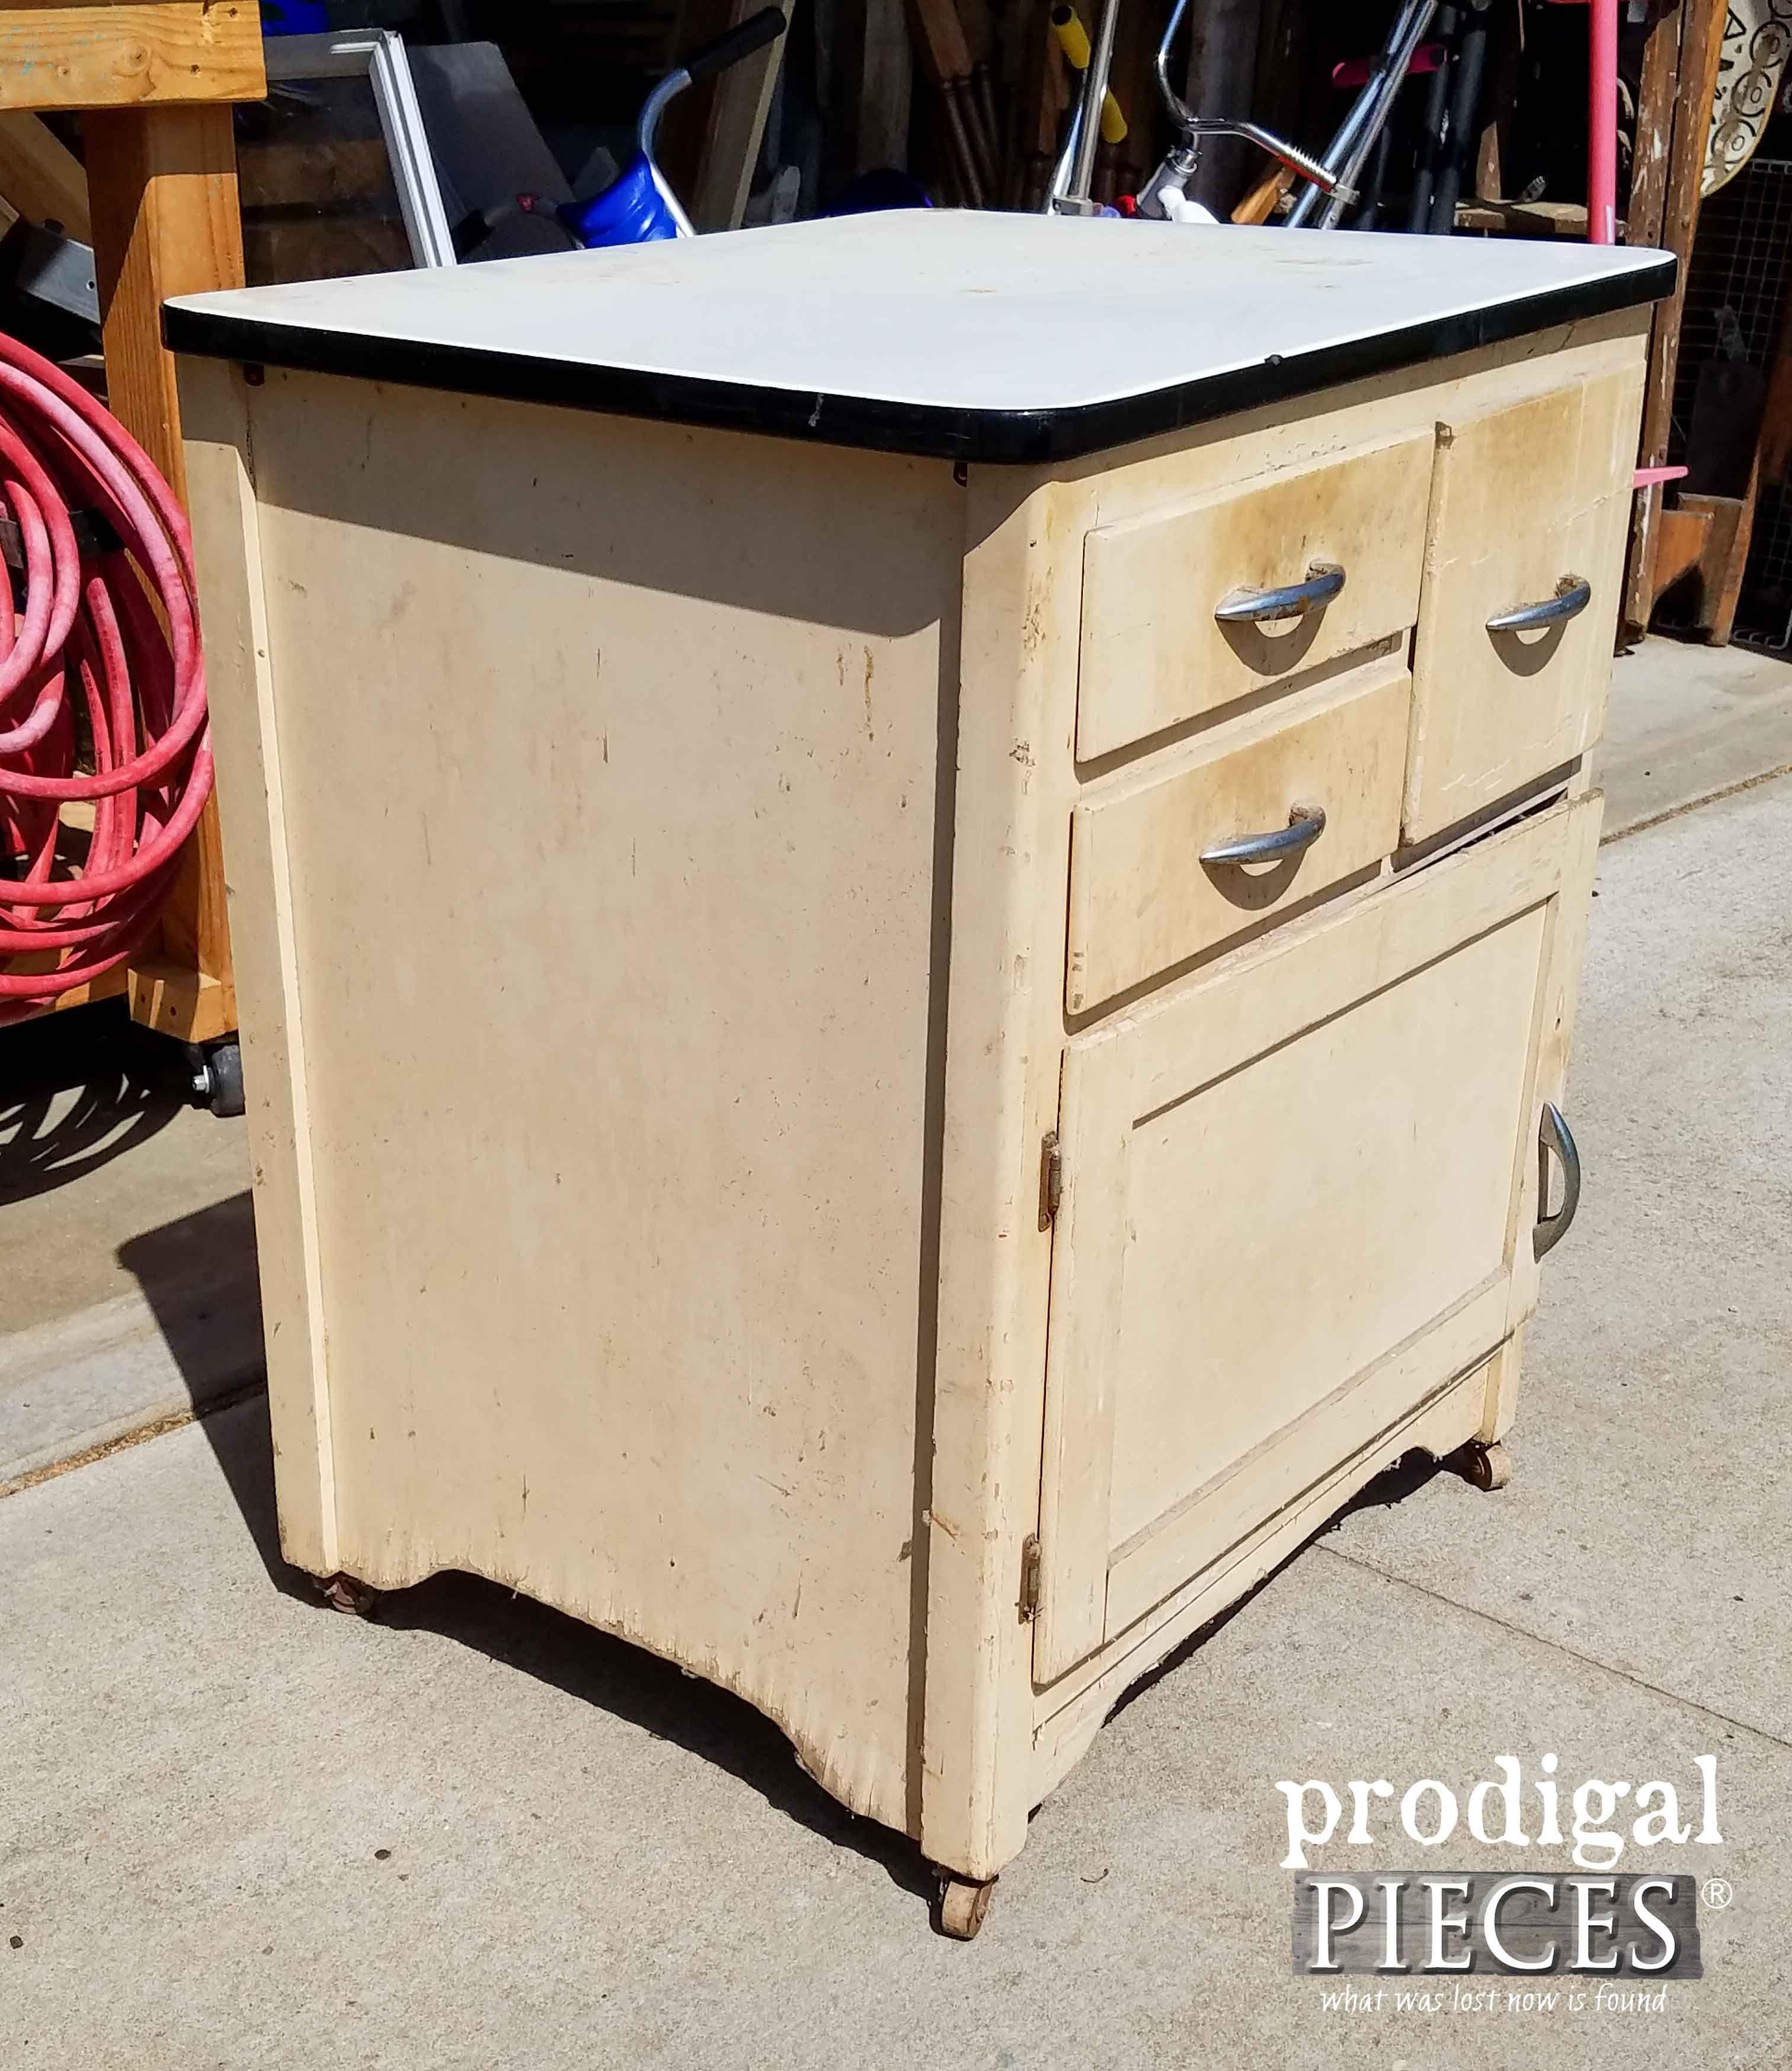 Side Of Enamel Cabinet With Damage Prodigal Pieces Prodigalpieces Com Vintage Metal Cabinet Painting Metal Cabinets Metal Kitchen Cabinets